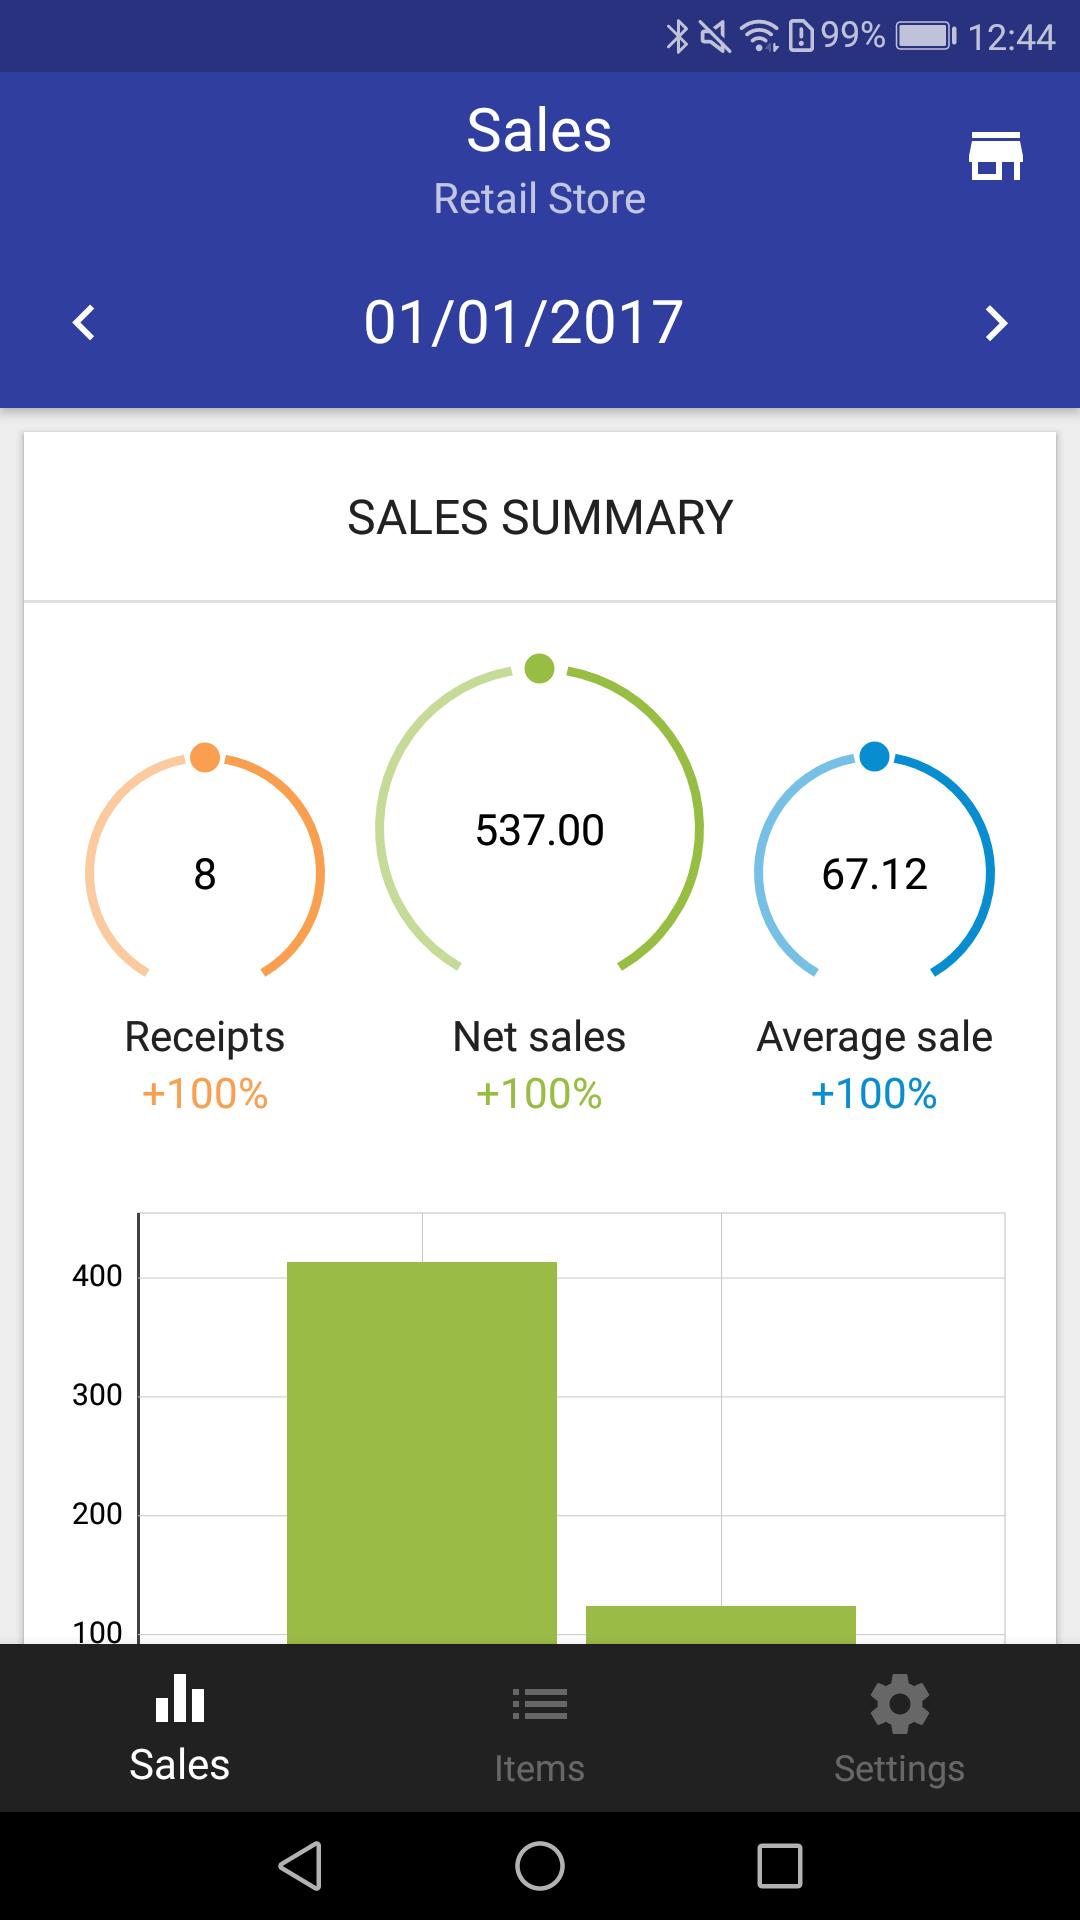 Sales summary